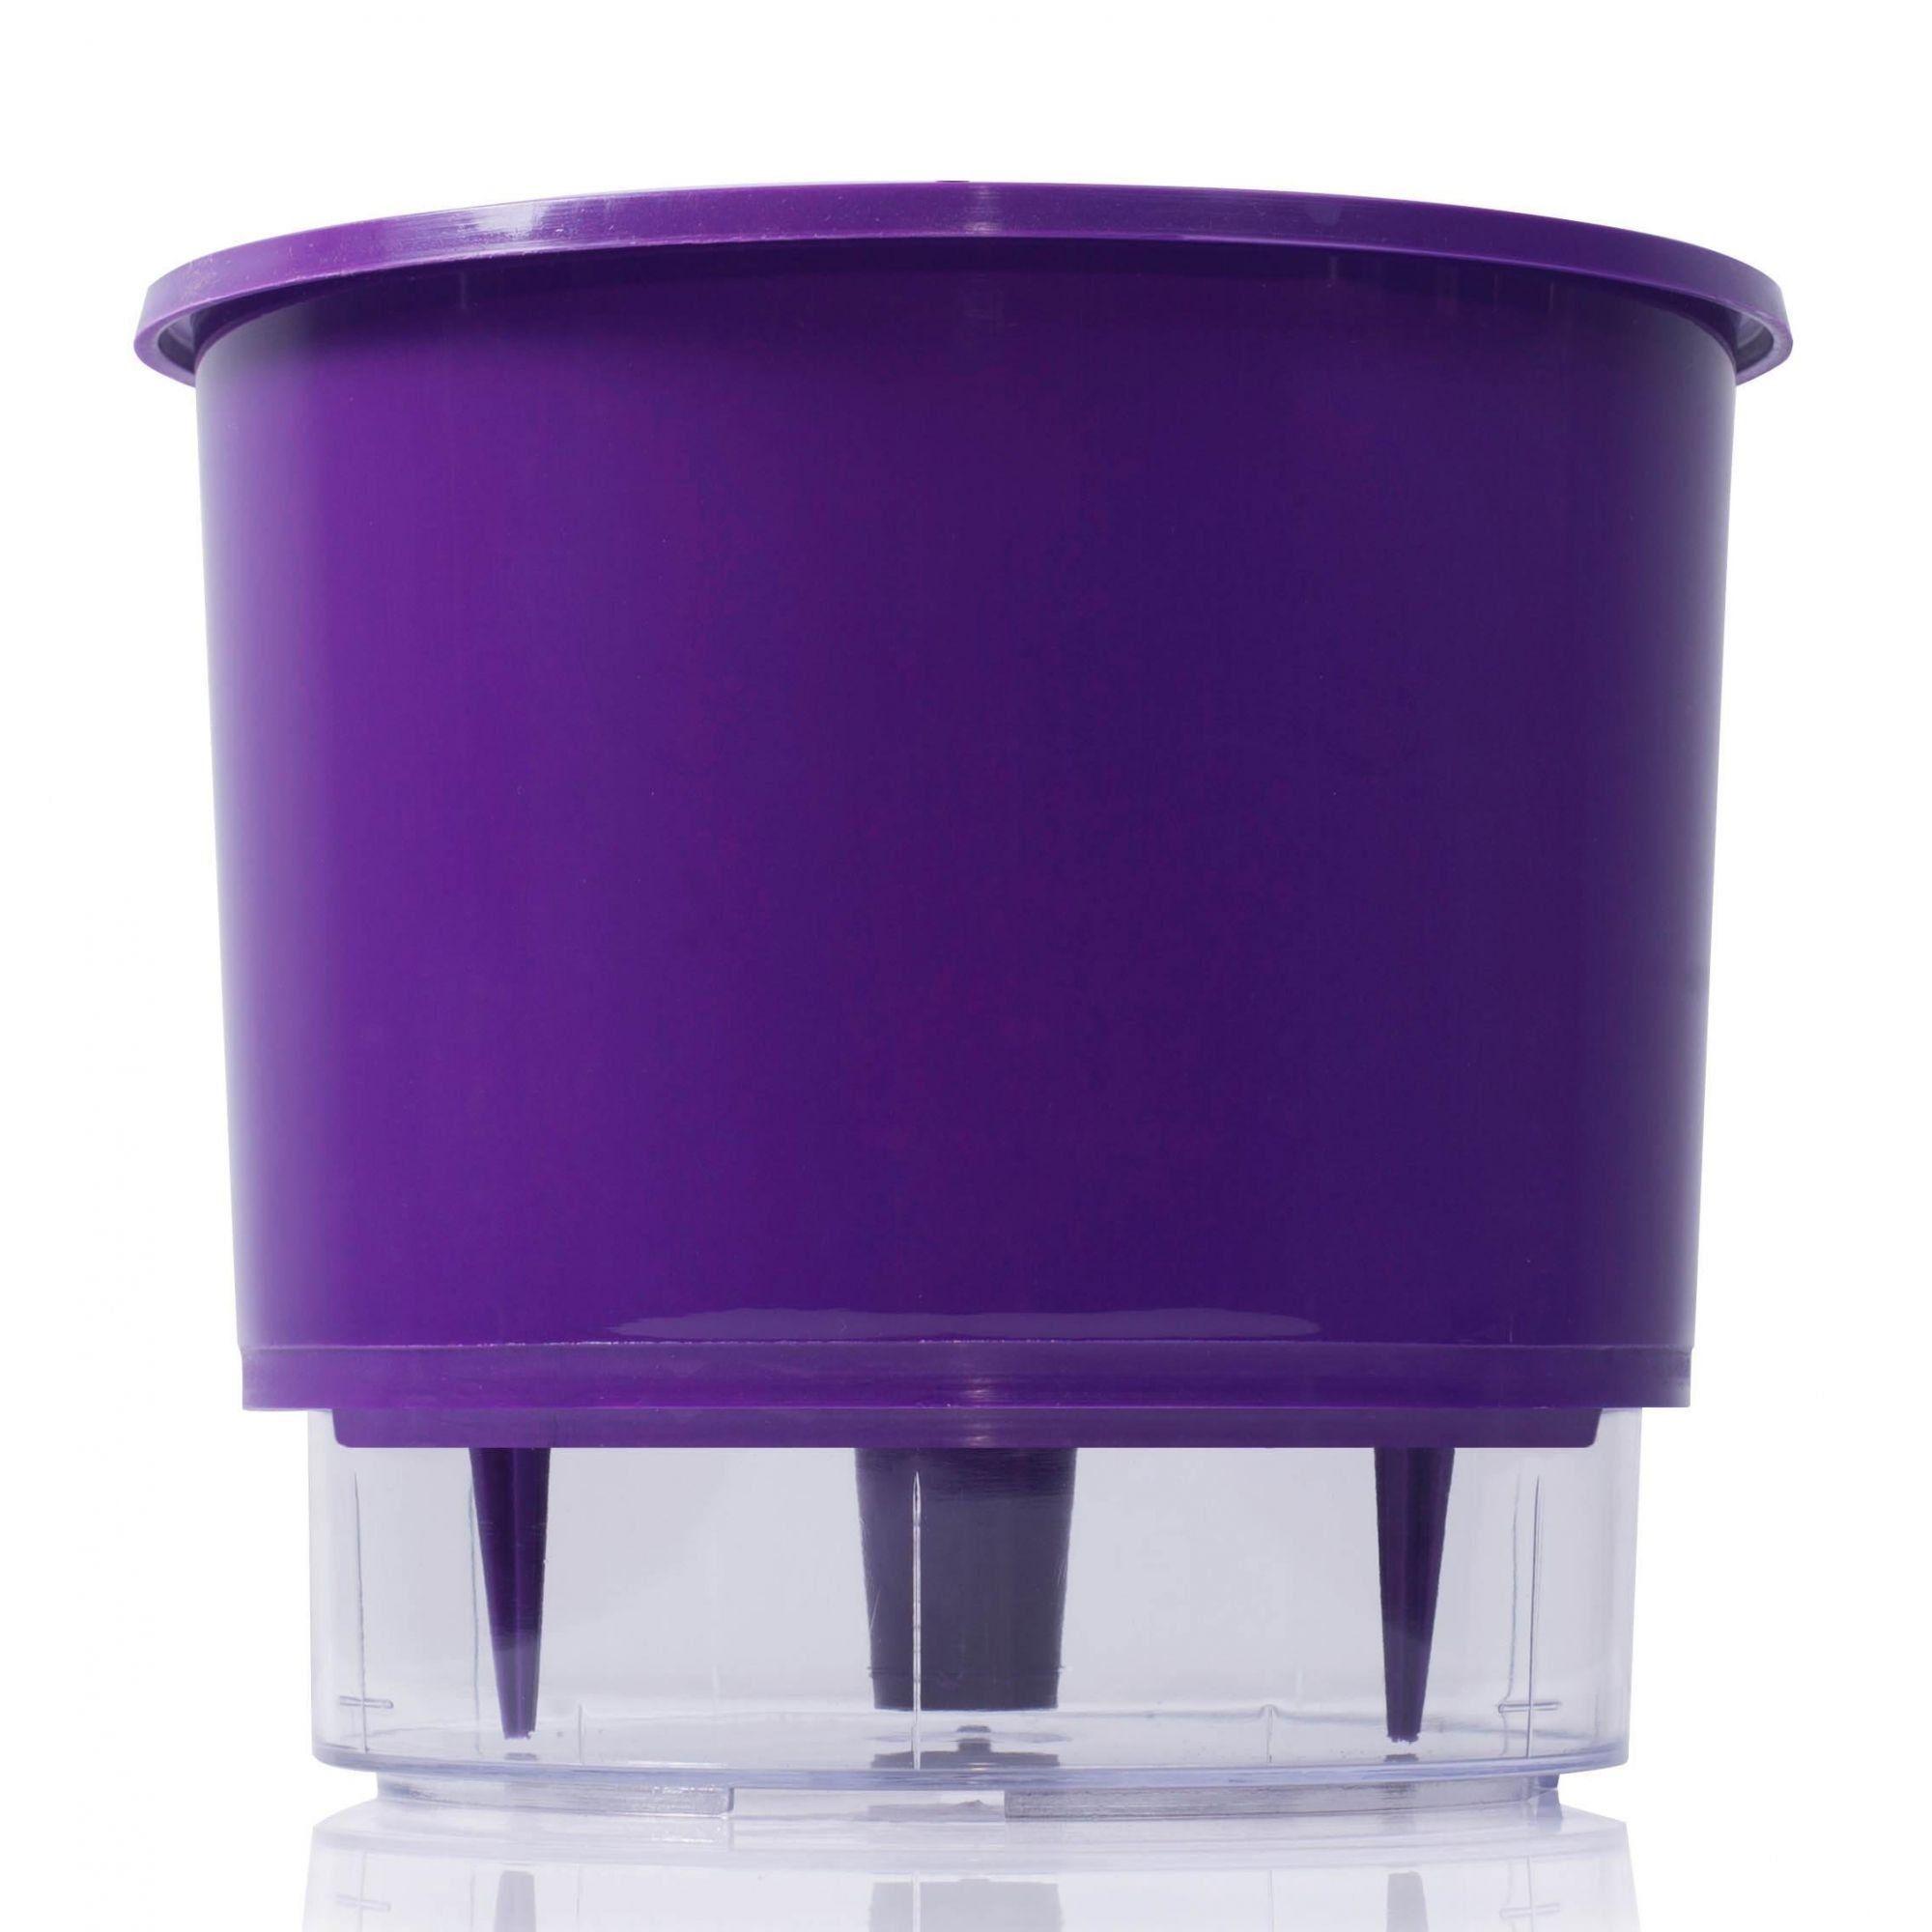 Vaso Autoirrigável Pequeno 12cm x 11cm Roxo N02  - Vasos Raiz Loja Oficial